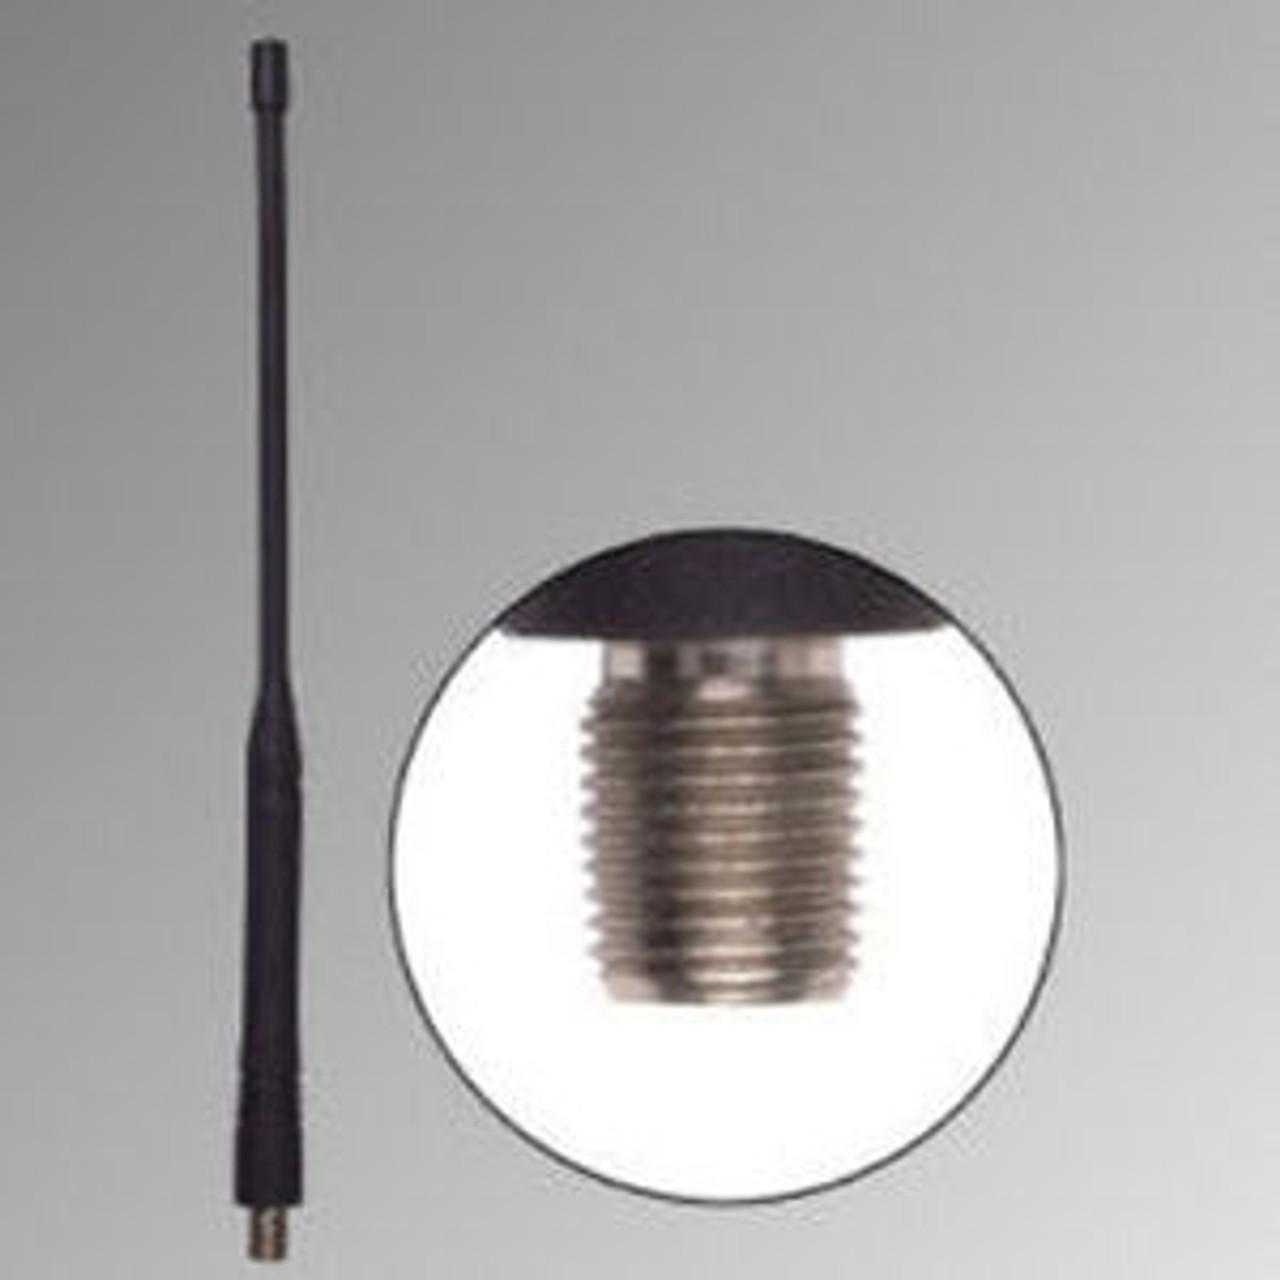 "Bendix King KA99 Long Range Antenna - 10.5"", VHF, 155-165 MHz"